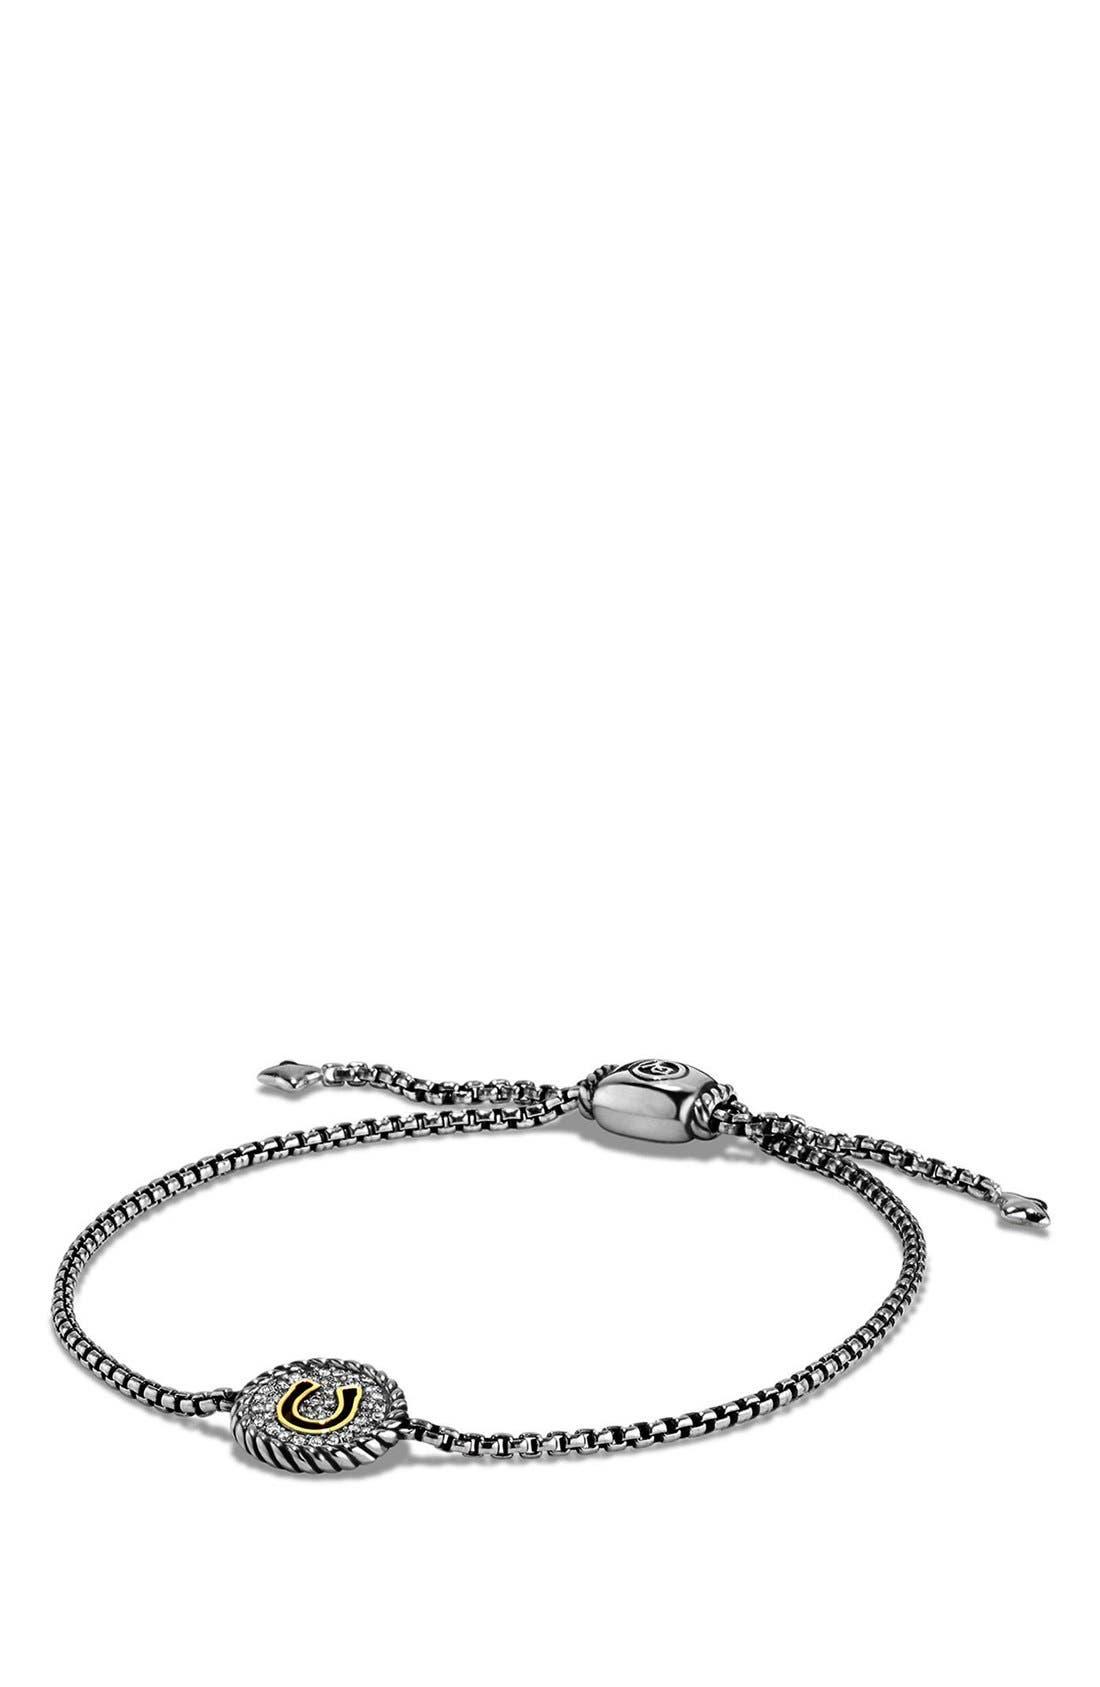 David Yurman 'Cable Collectibles' Horseshoe Station Bracelet with Diamonds